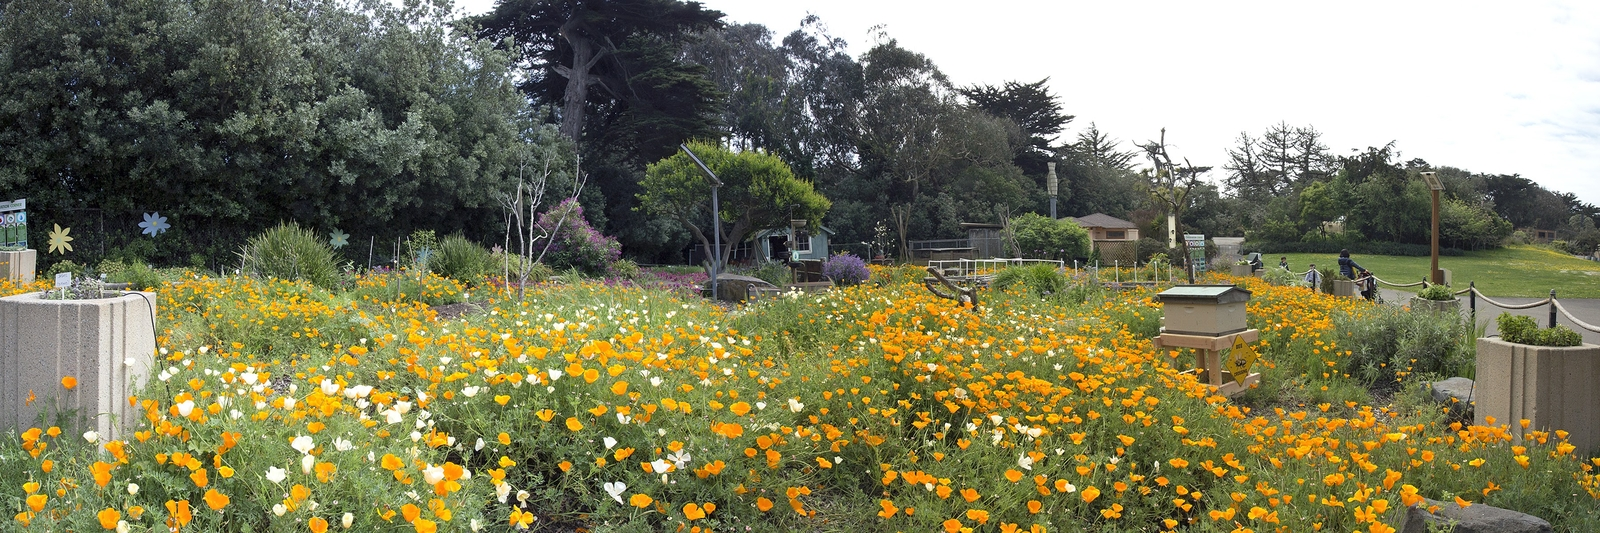 The San Francisco Zoo Gardens San Francisco Travel Association Photo